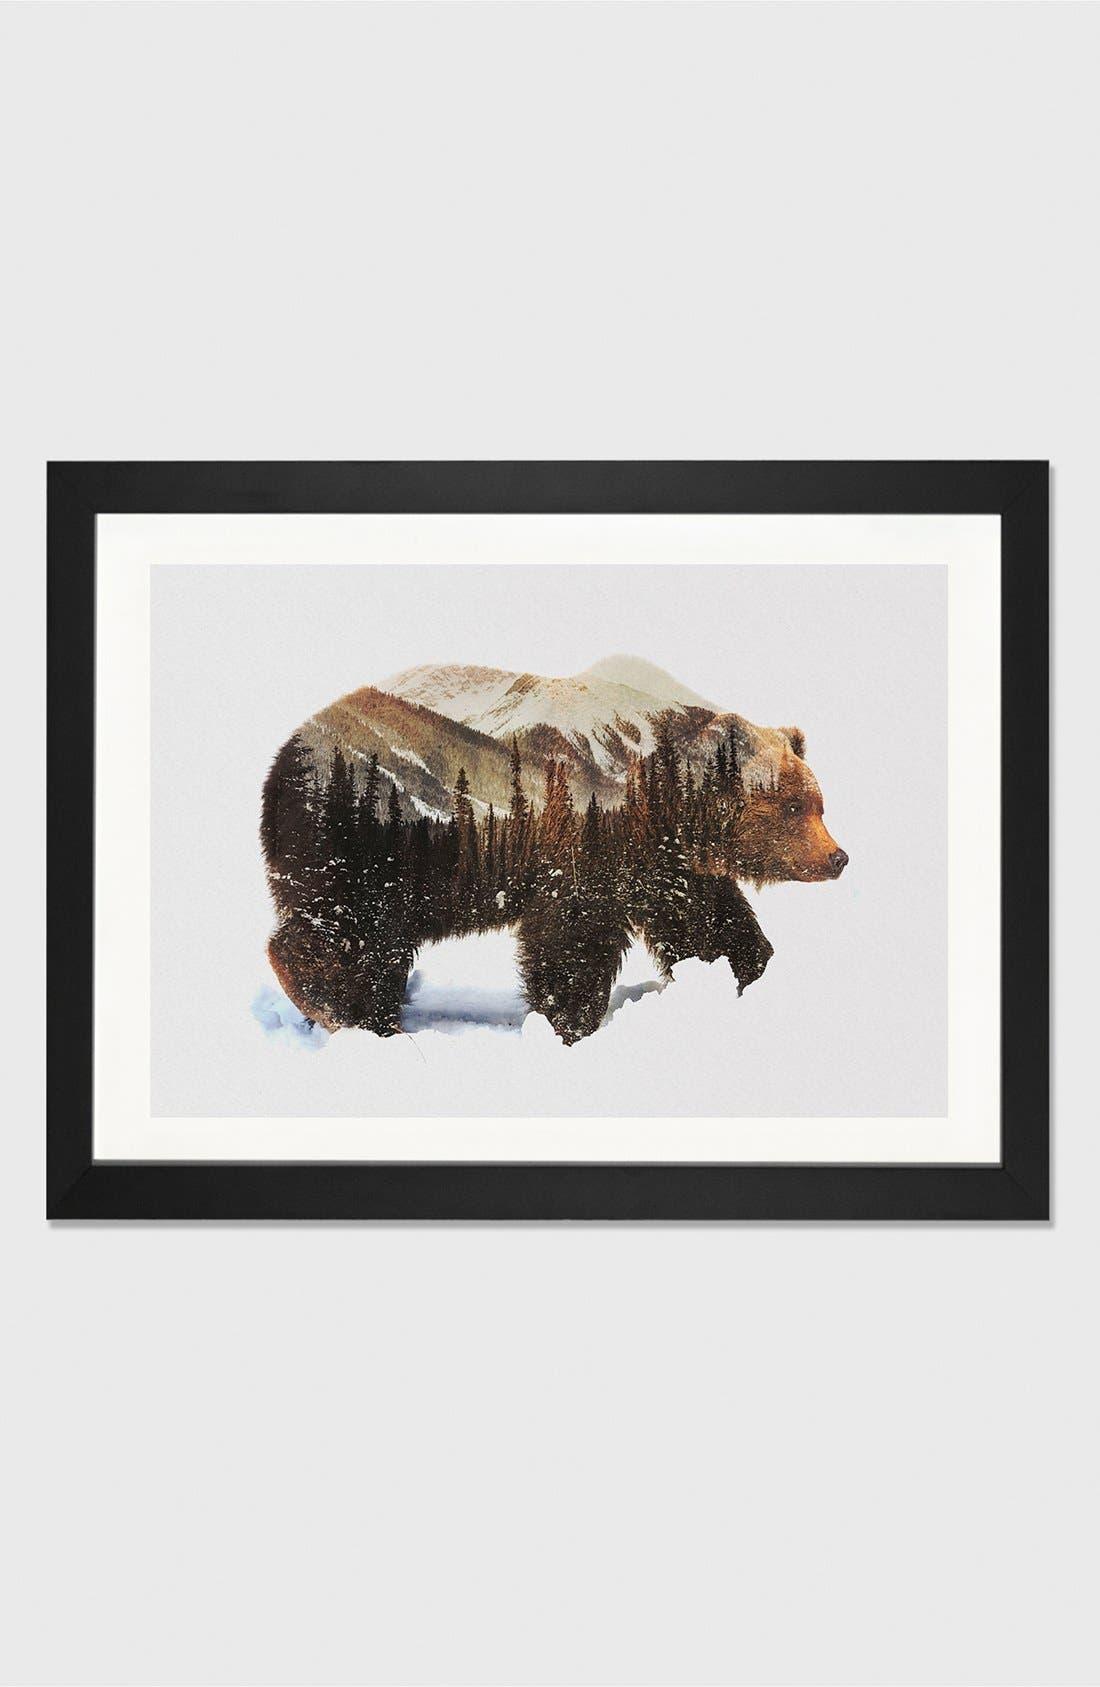 Alternate Image 1 Selected - iCanvas 'Grizzly Bear' Giclée Print Framed Canvas Art